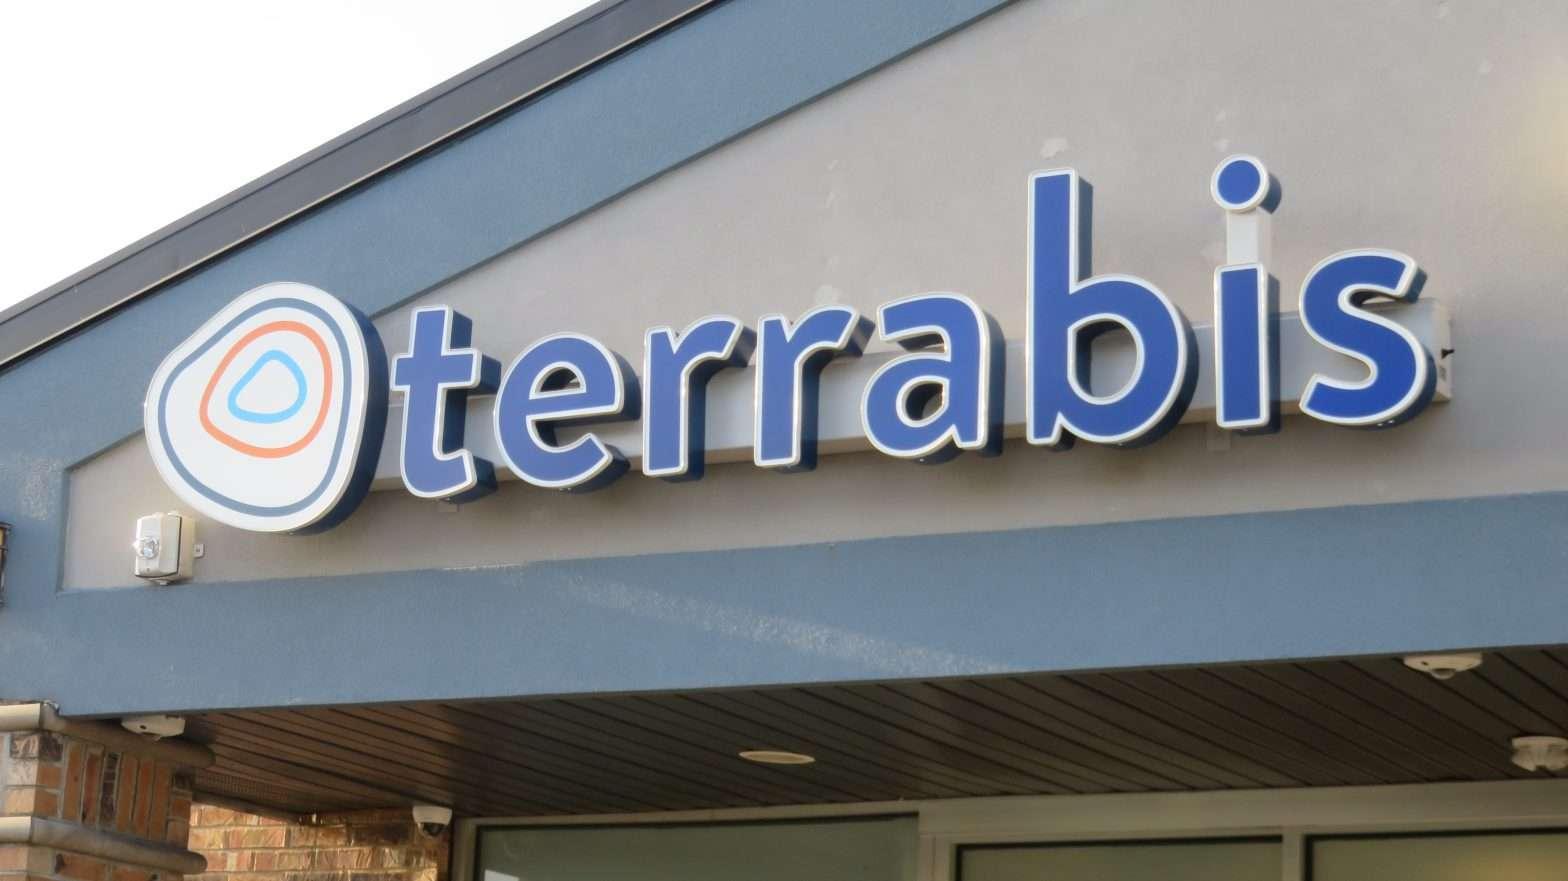 Terrabis - Creve Coeur Cannabis store in Creve Coeur, Missouri 11062 Olive Blvd, Creve Coeur, MO 63141